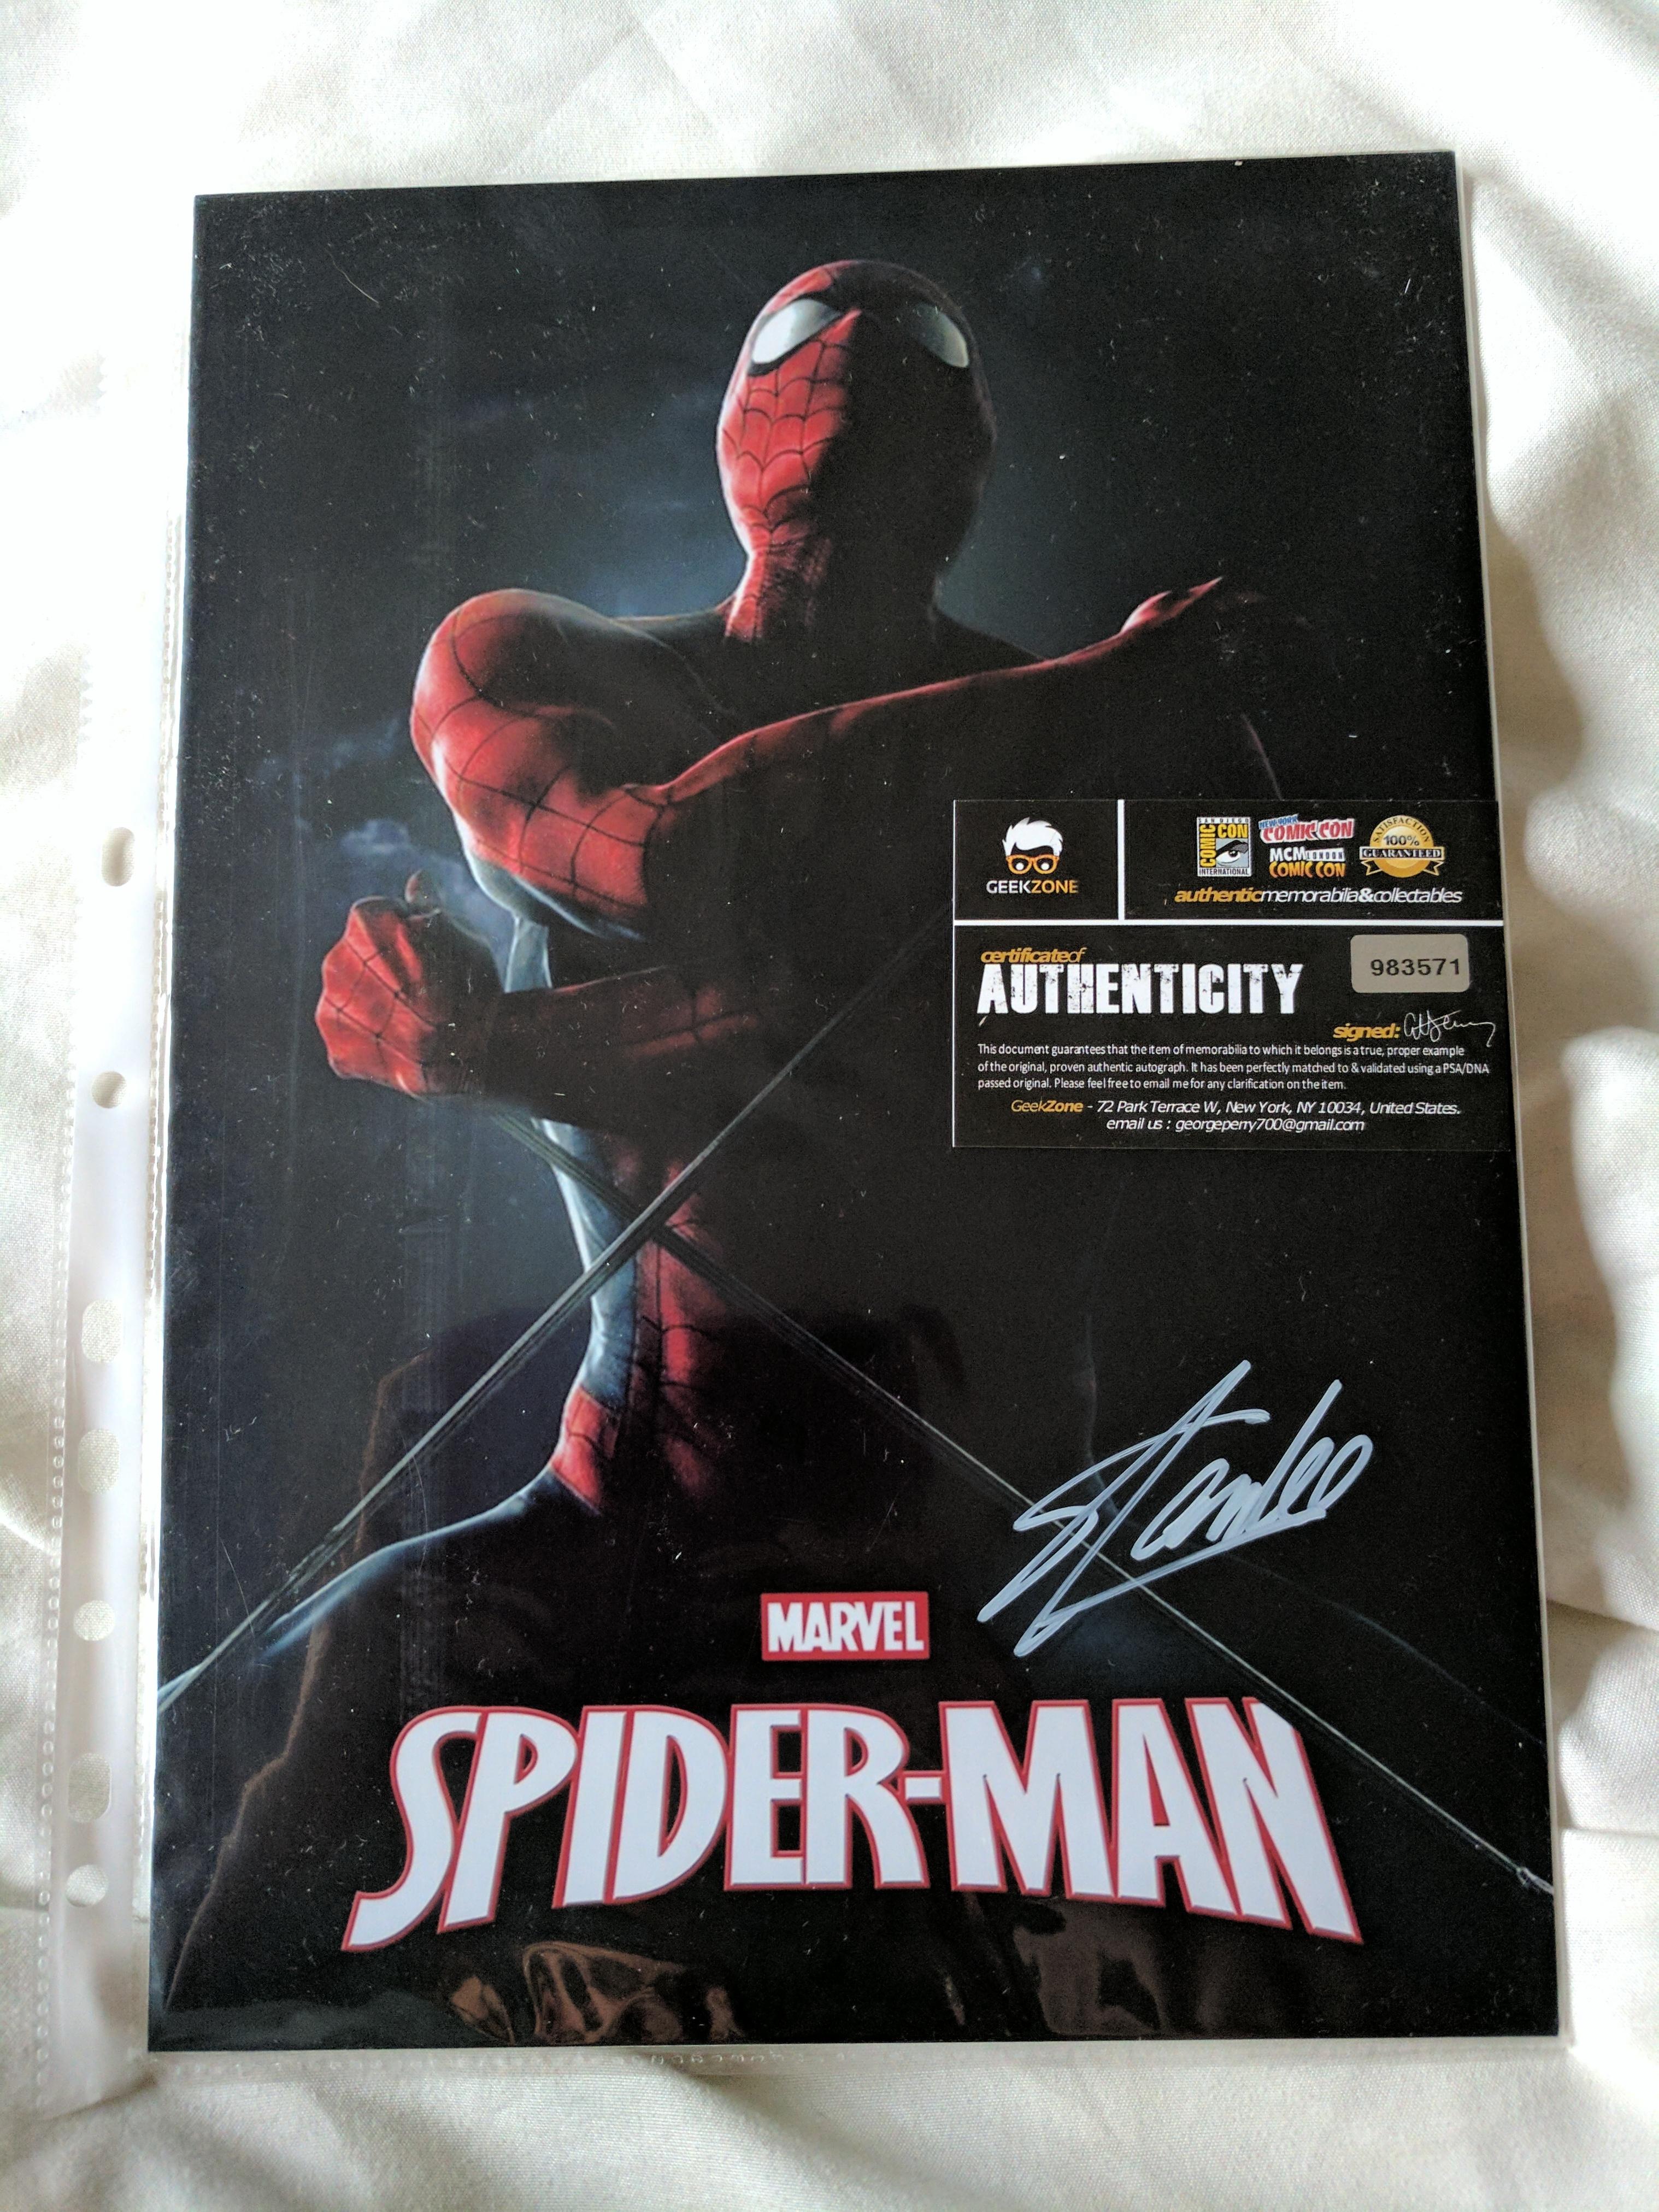 Marvel Signed Photographs